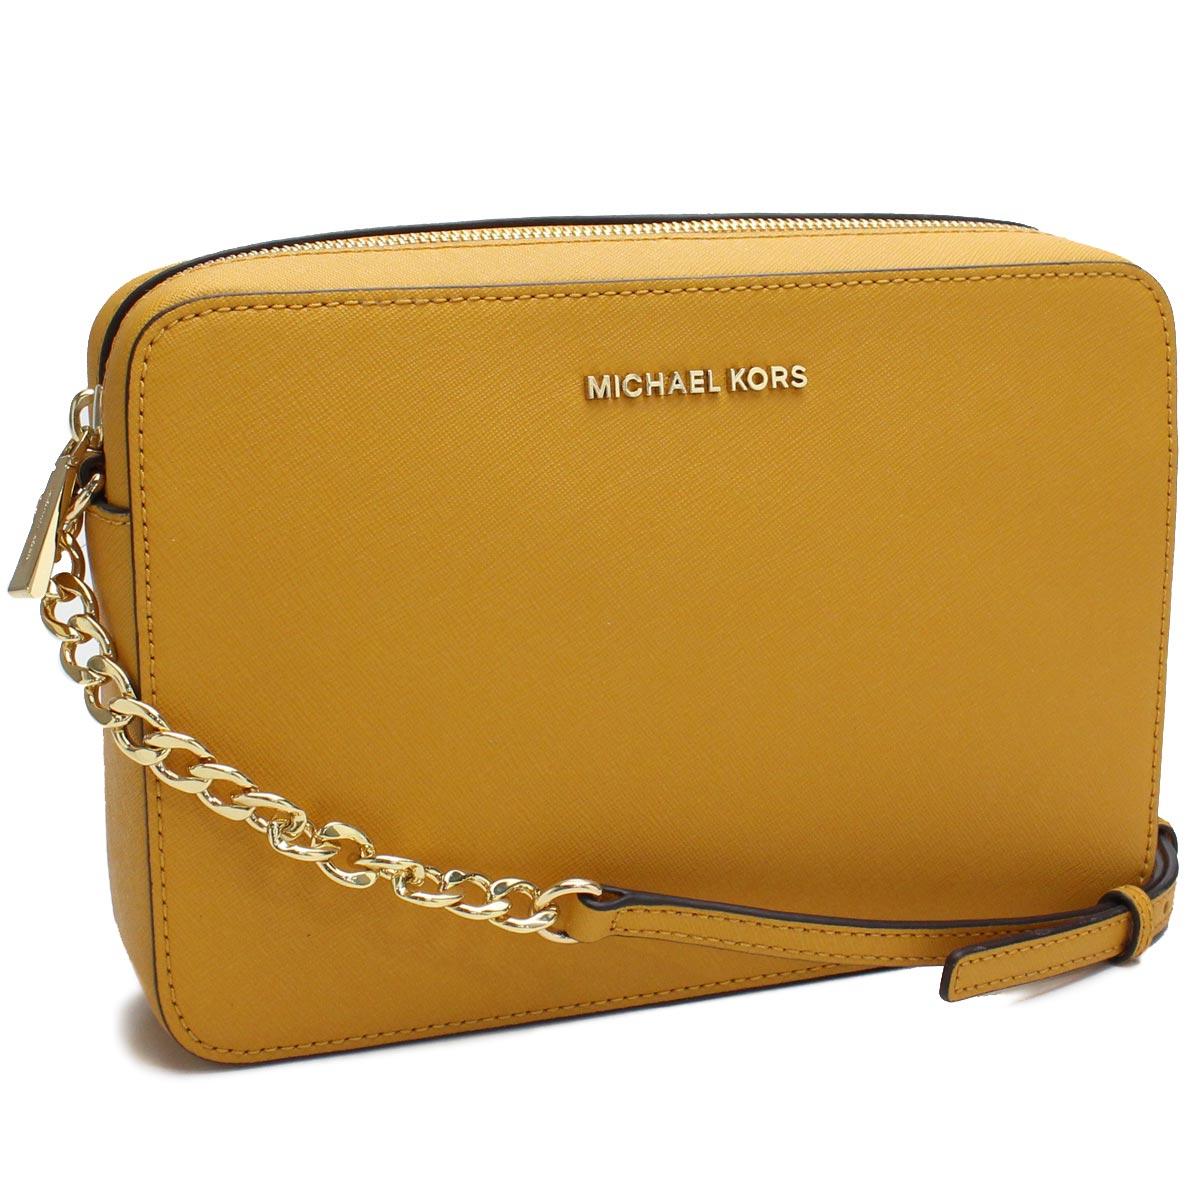 d06a14cd1657 Bighit The total brand wholesale  Take Michael Kors (MICHAEL KORS)  CROSSBODIES slant  shoulder bag 32S4GTVC3L MARIGOLD yellow